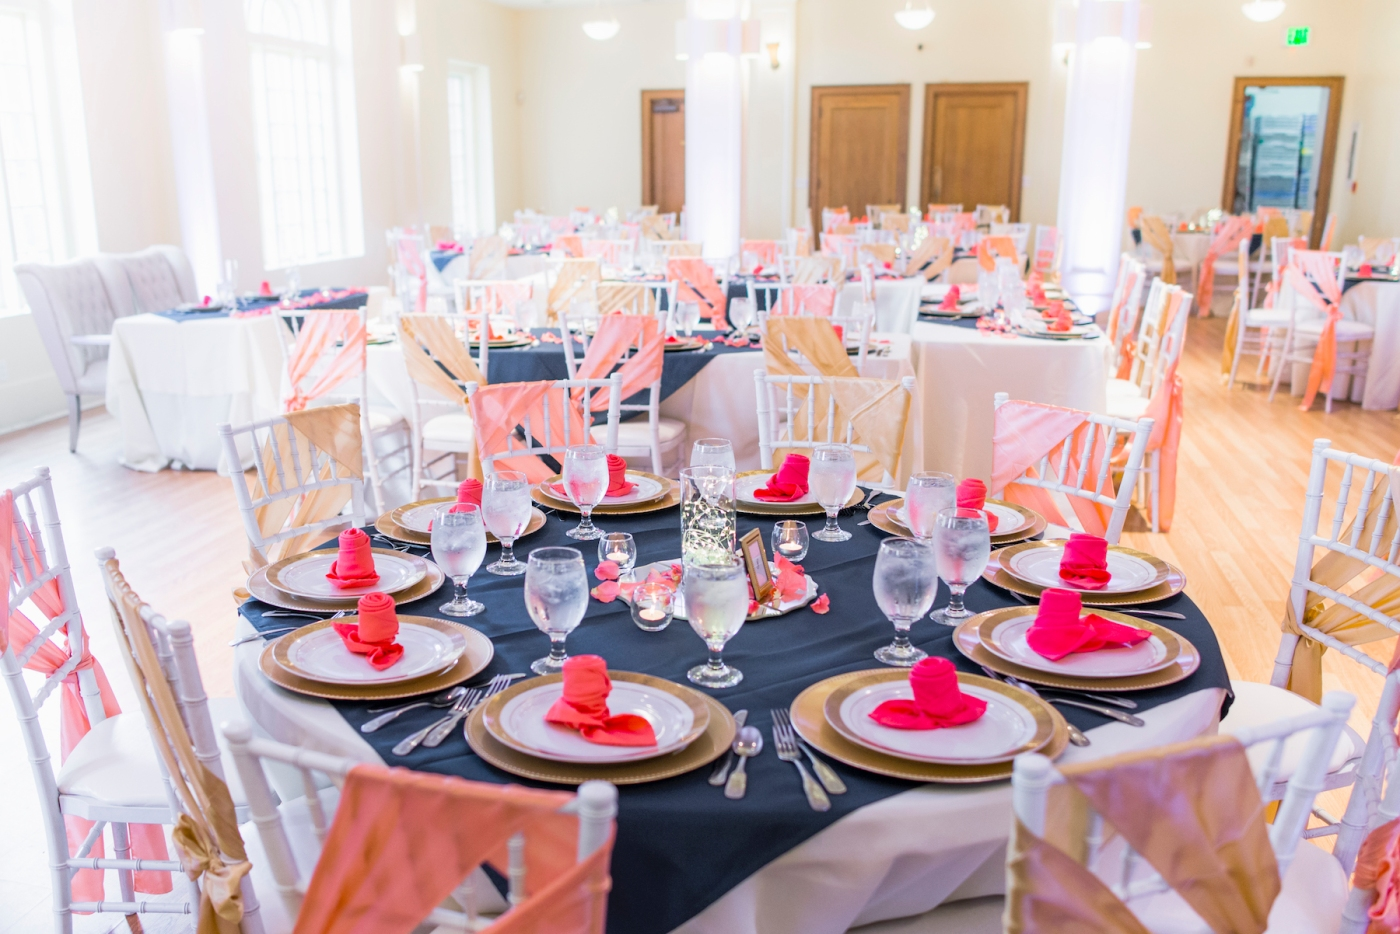 DSC_3071Everett_Wedding_Ballroom_Jane_Speleers_photography_Rachel_and_Edmund_cake cutting_2017